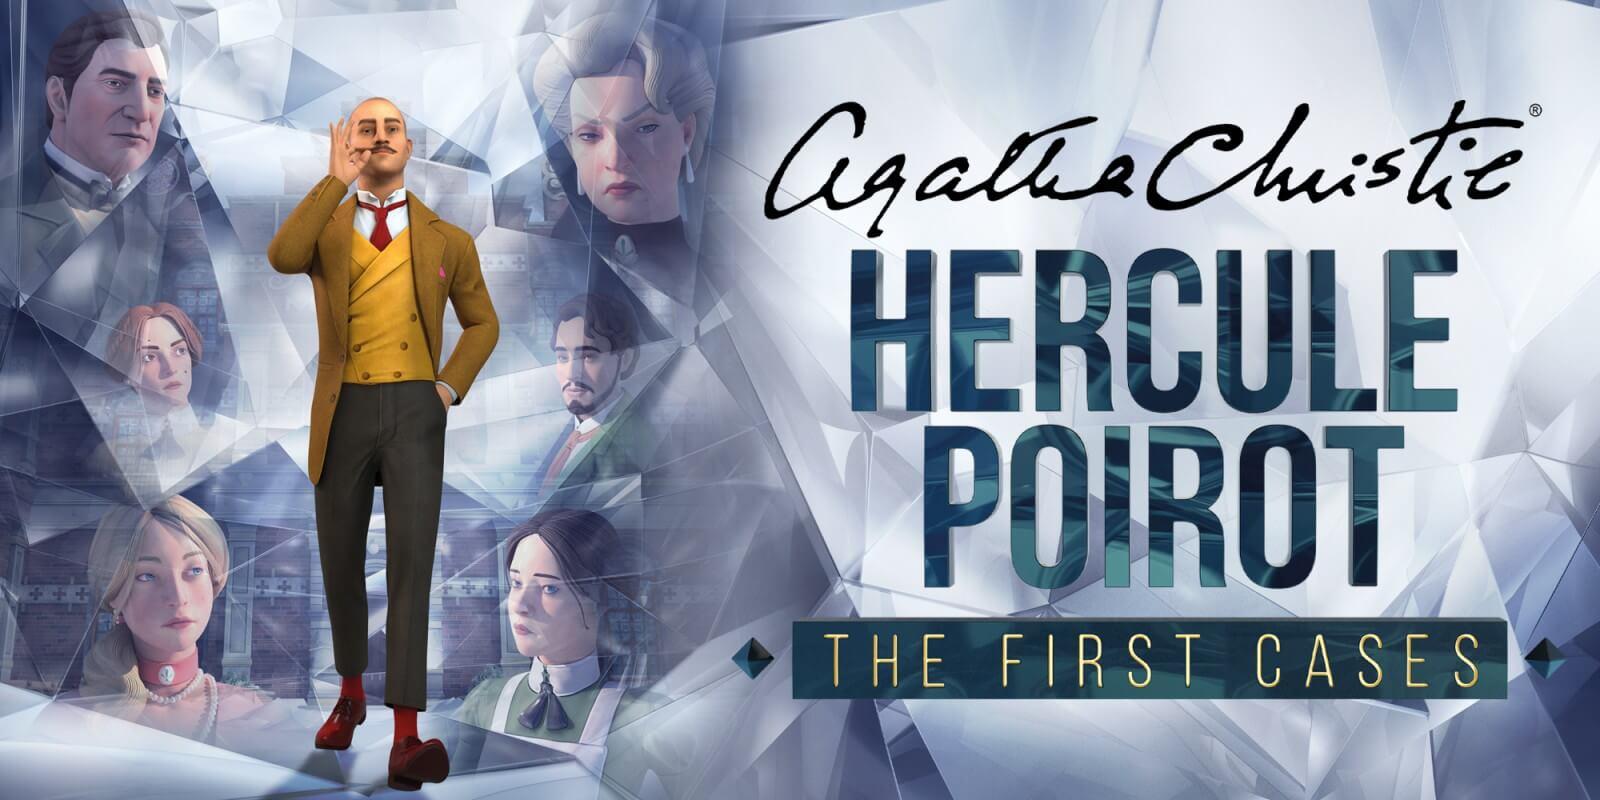 El misterio de Agatha Christie – Hercule Poirot: The First Cases ya llegó a PS4